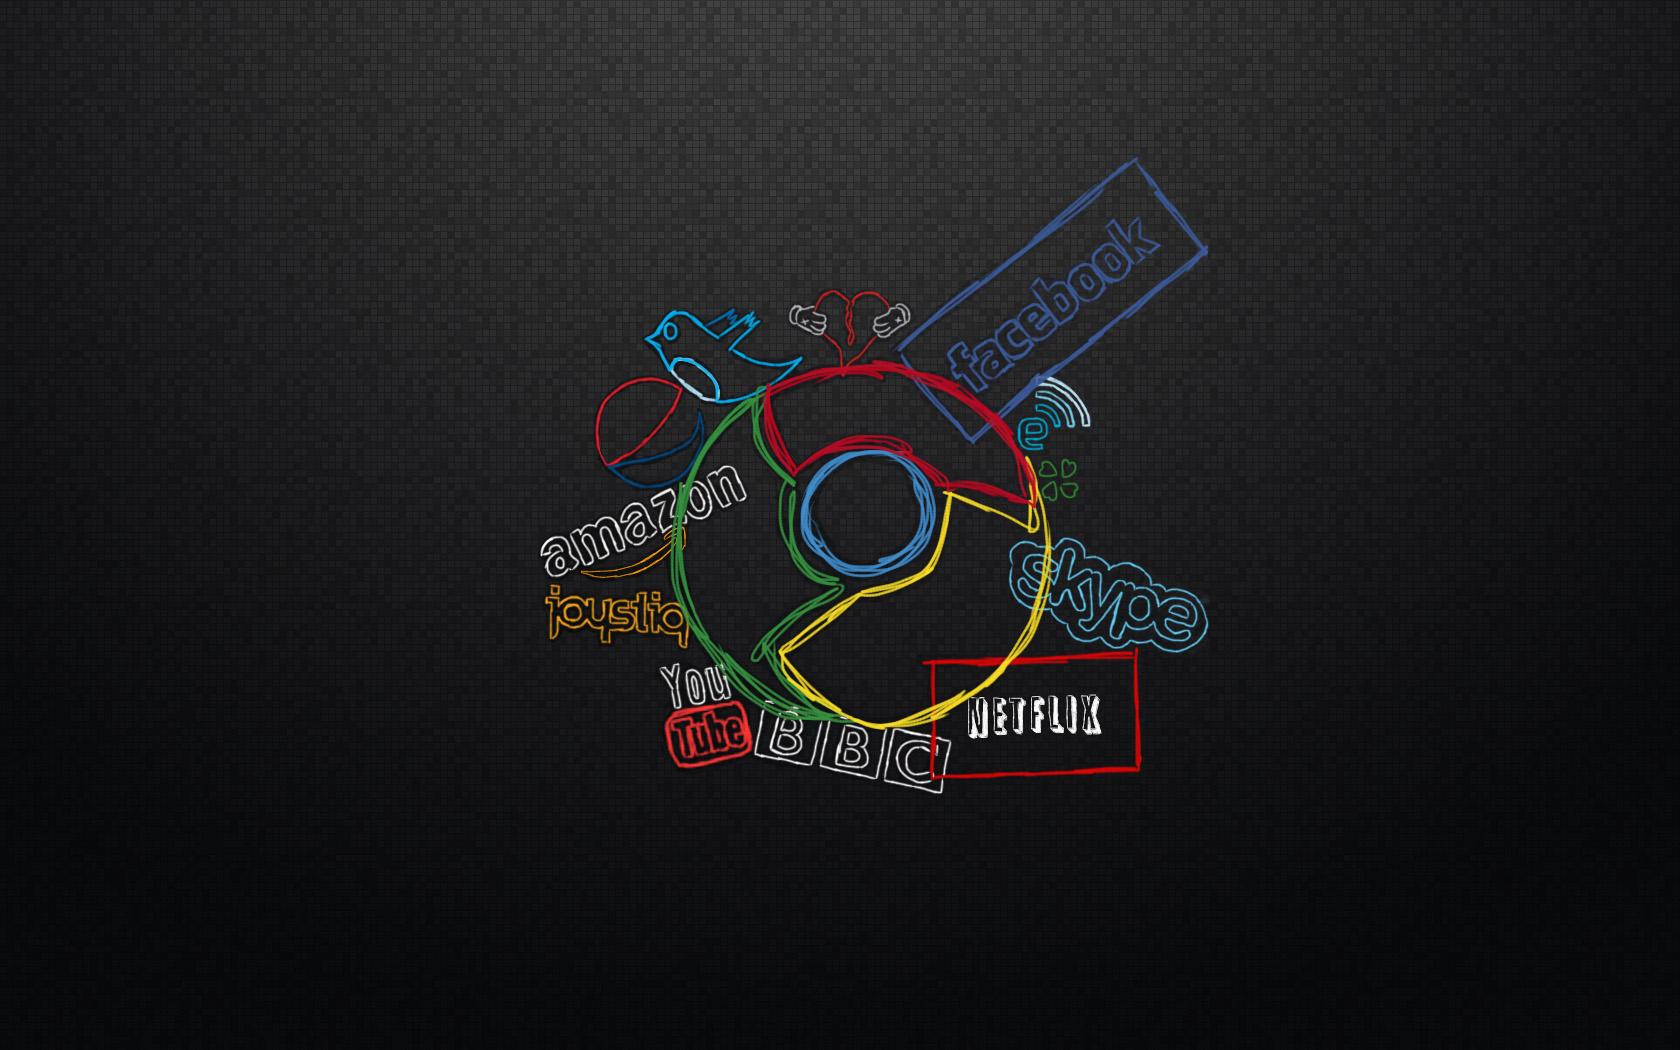 Google chrome themes gallery 2012 - Chrome Social Wallpapers Google Chrome Social Myspace Backgrounds